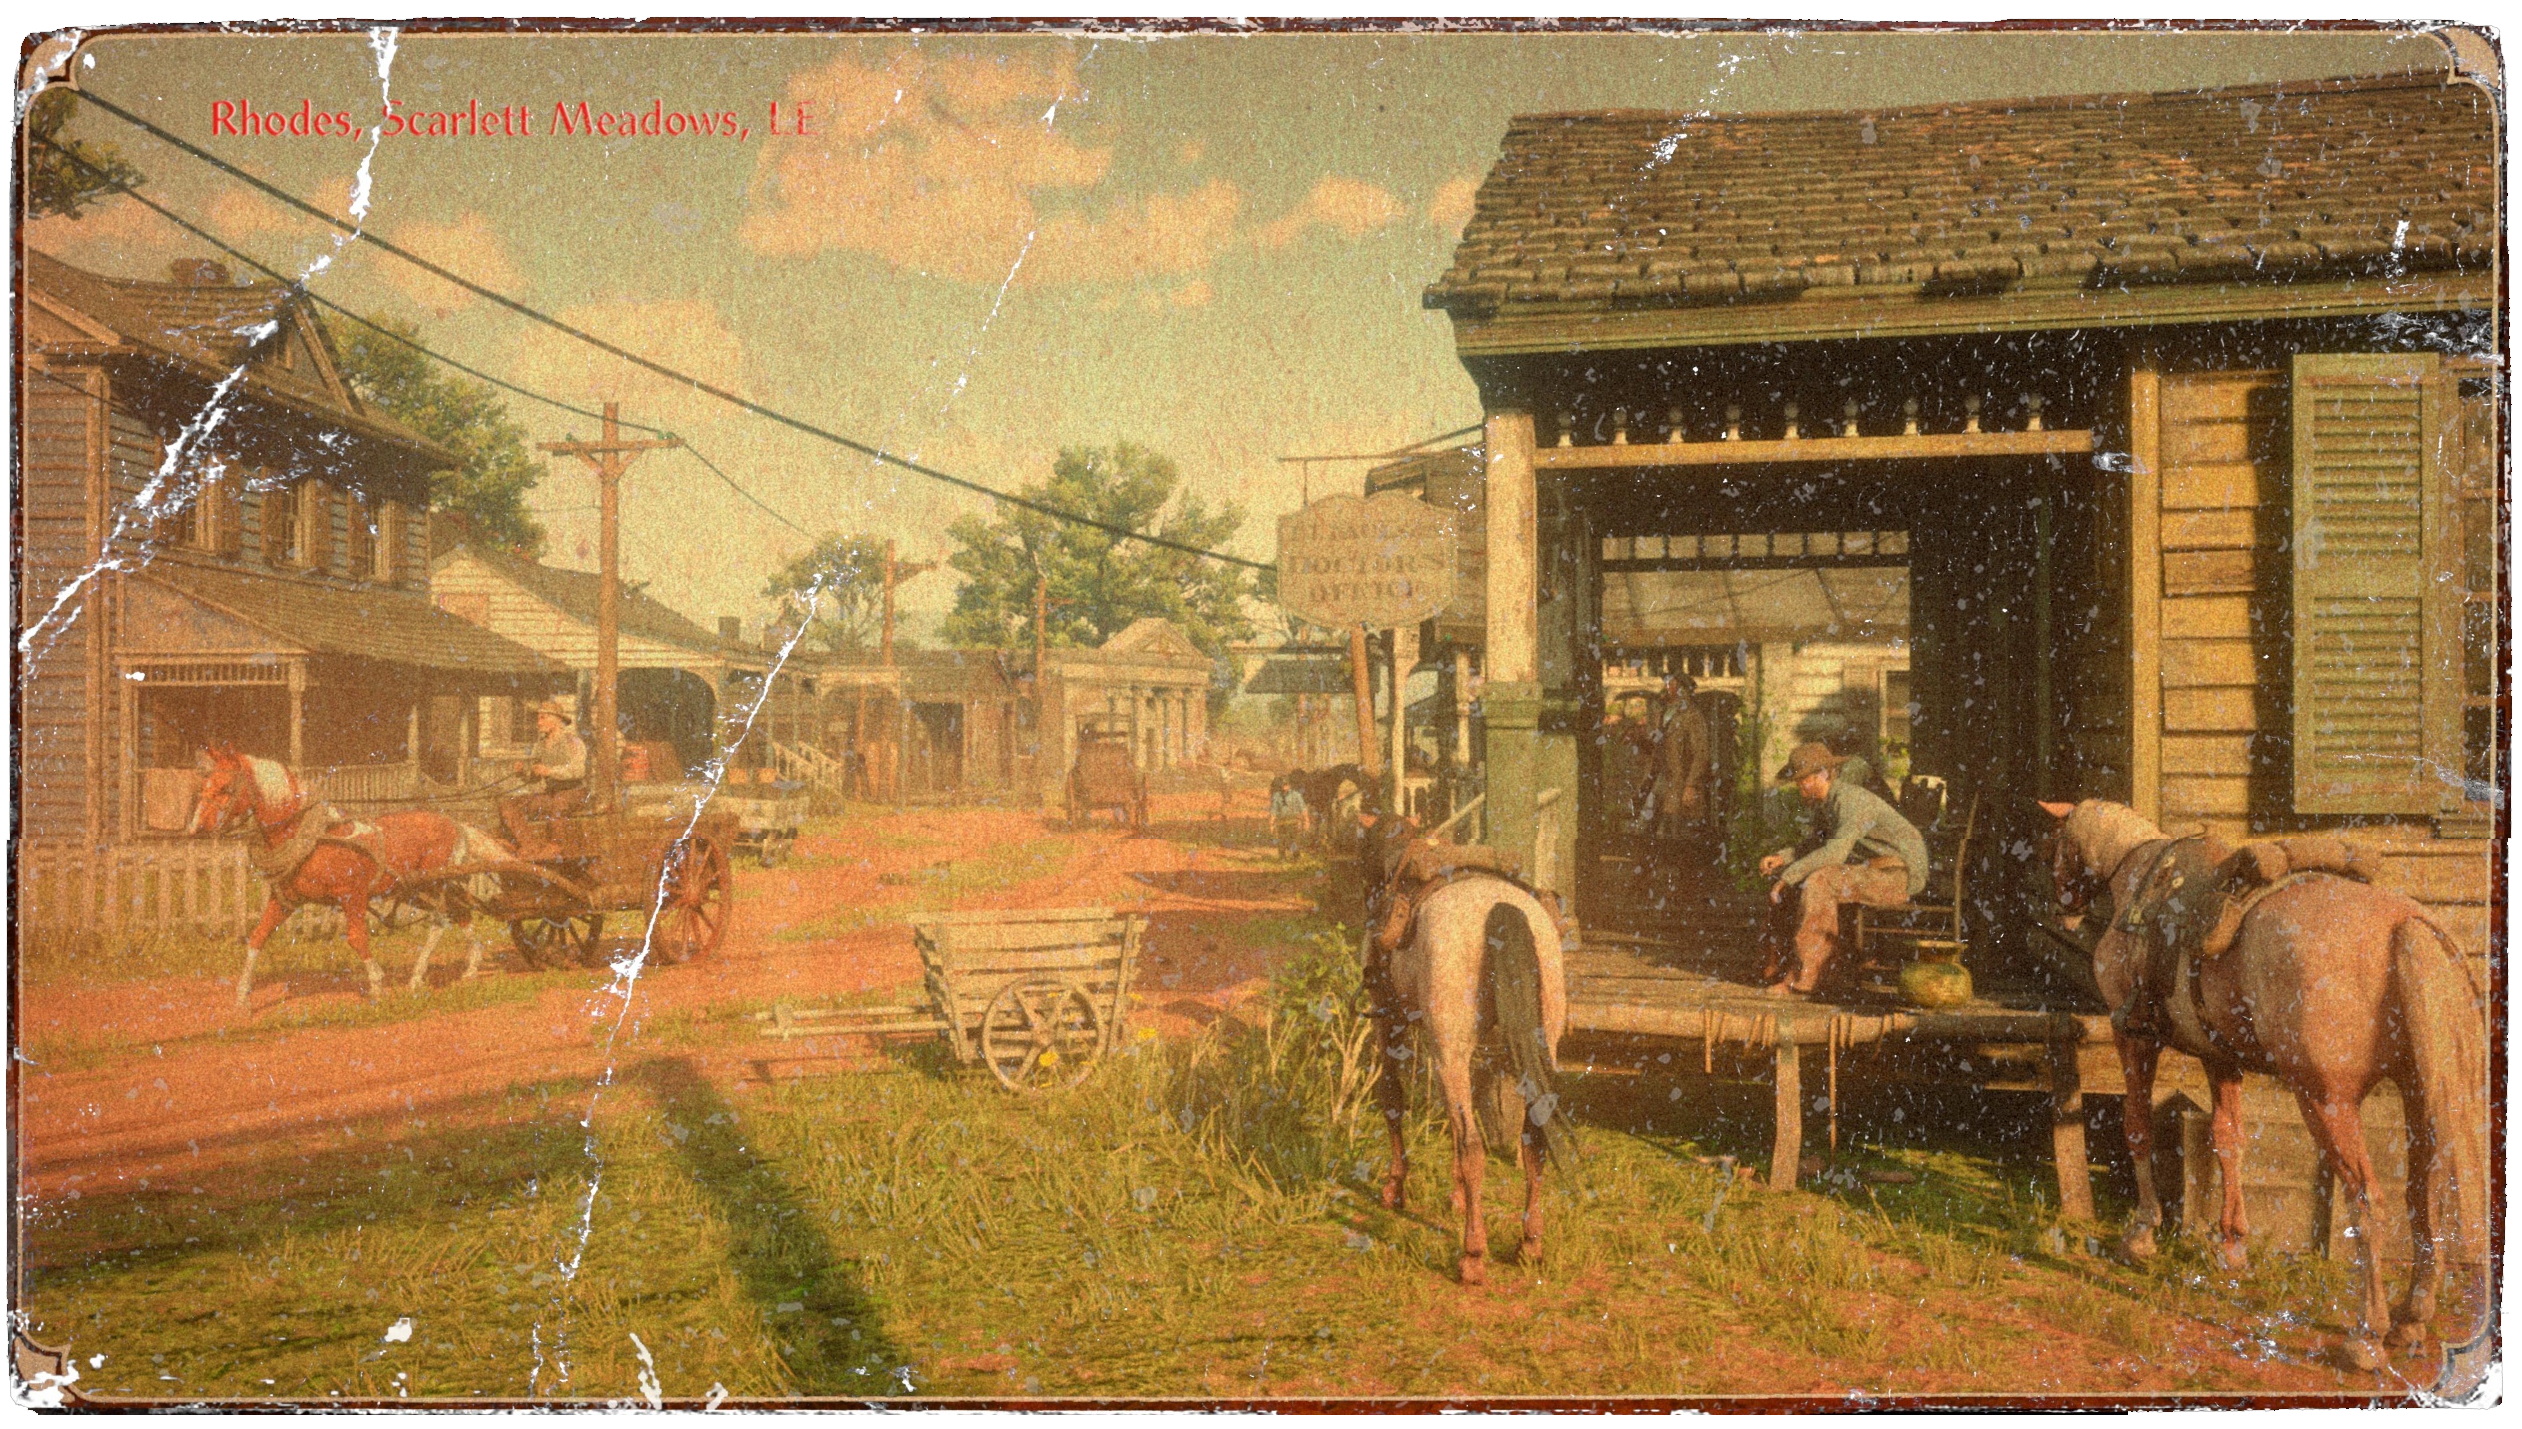 carte postale Rhodes